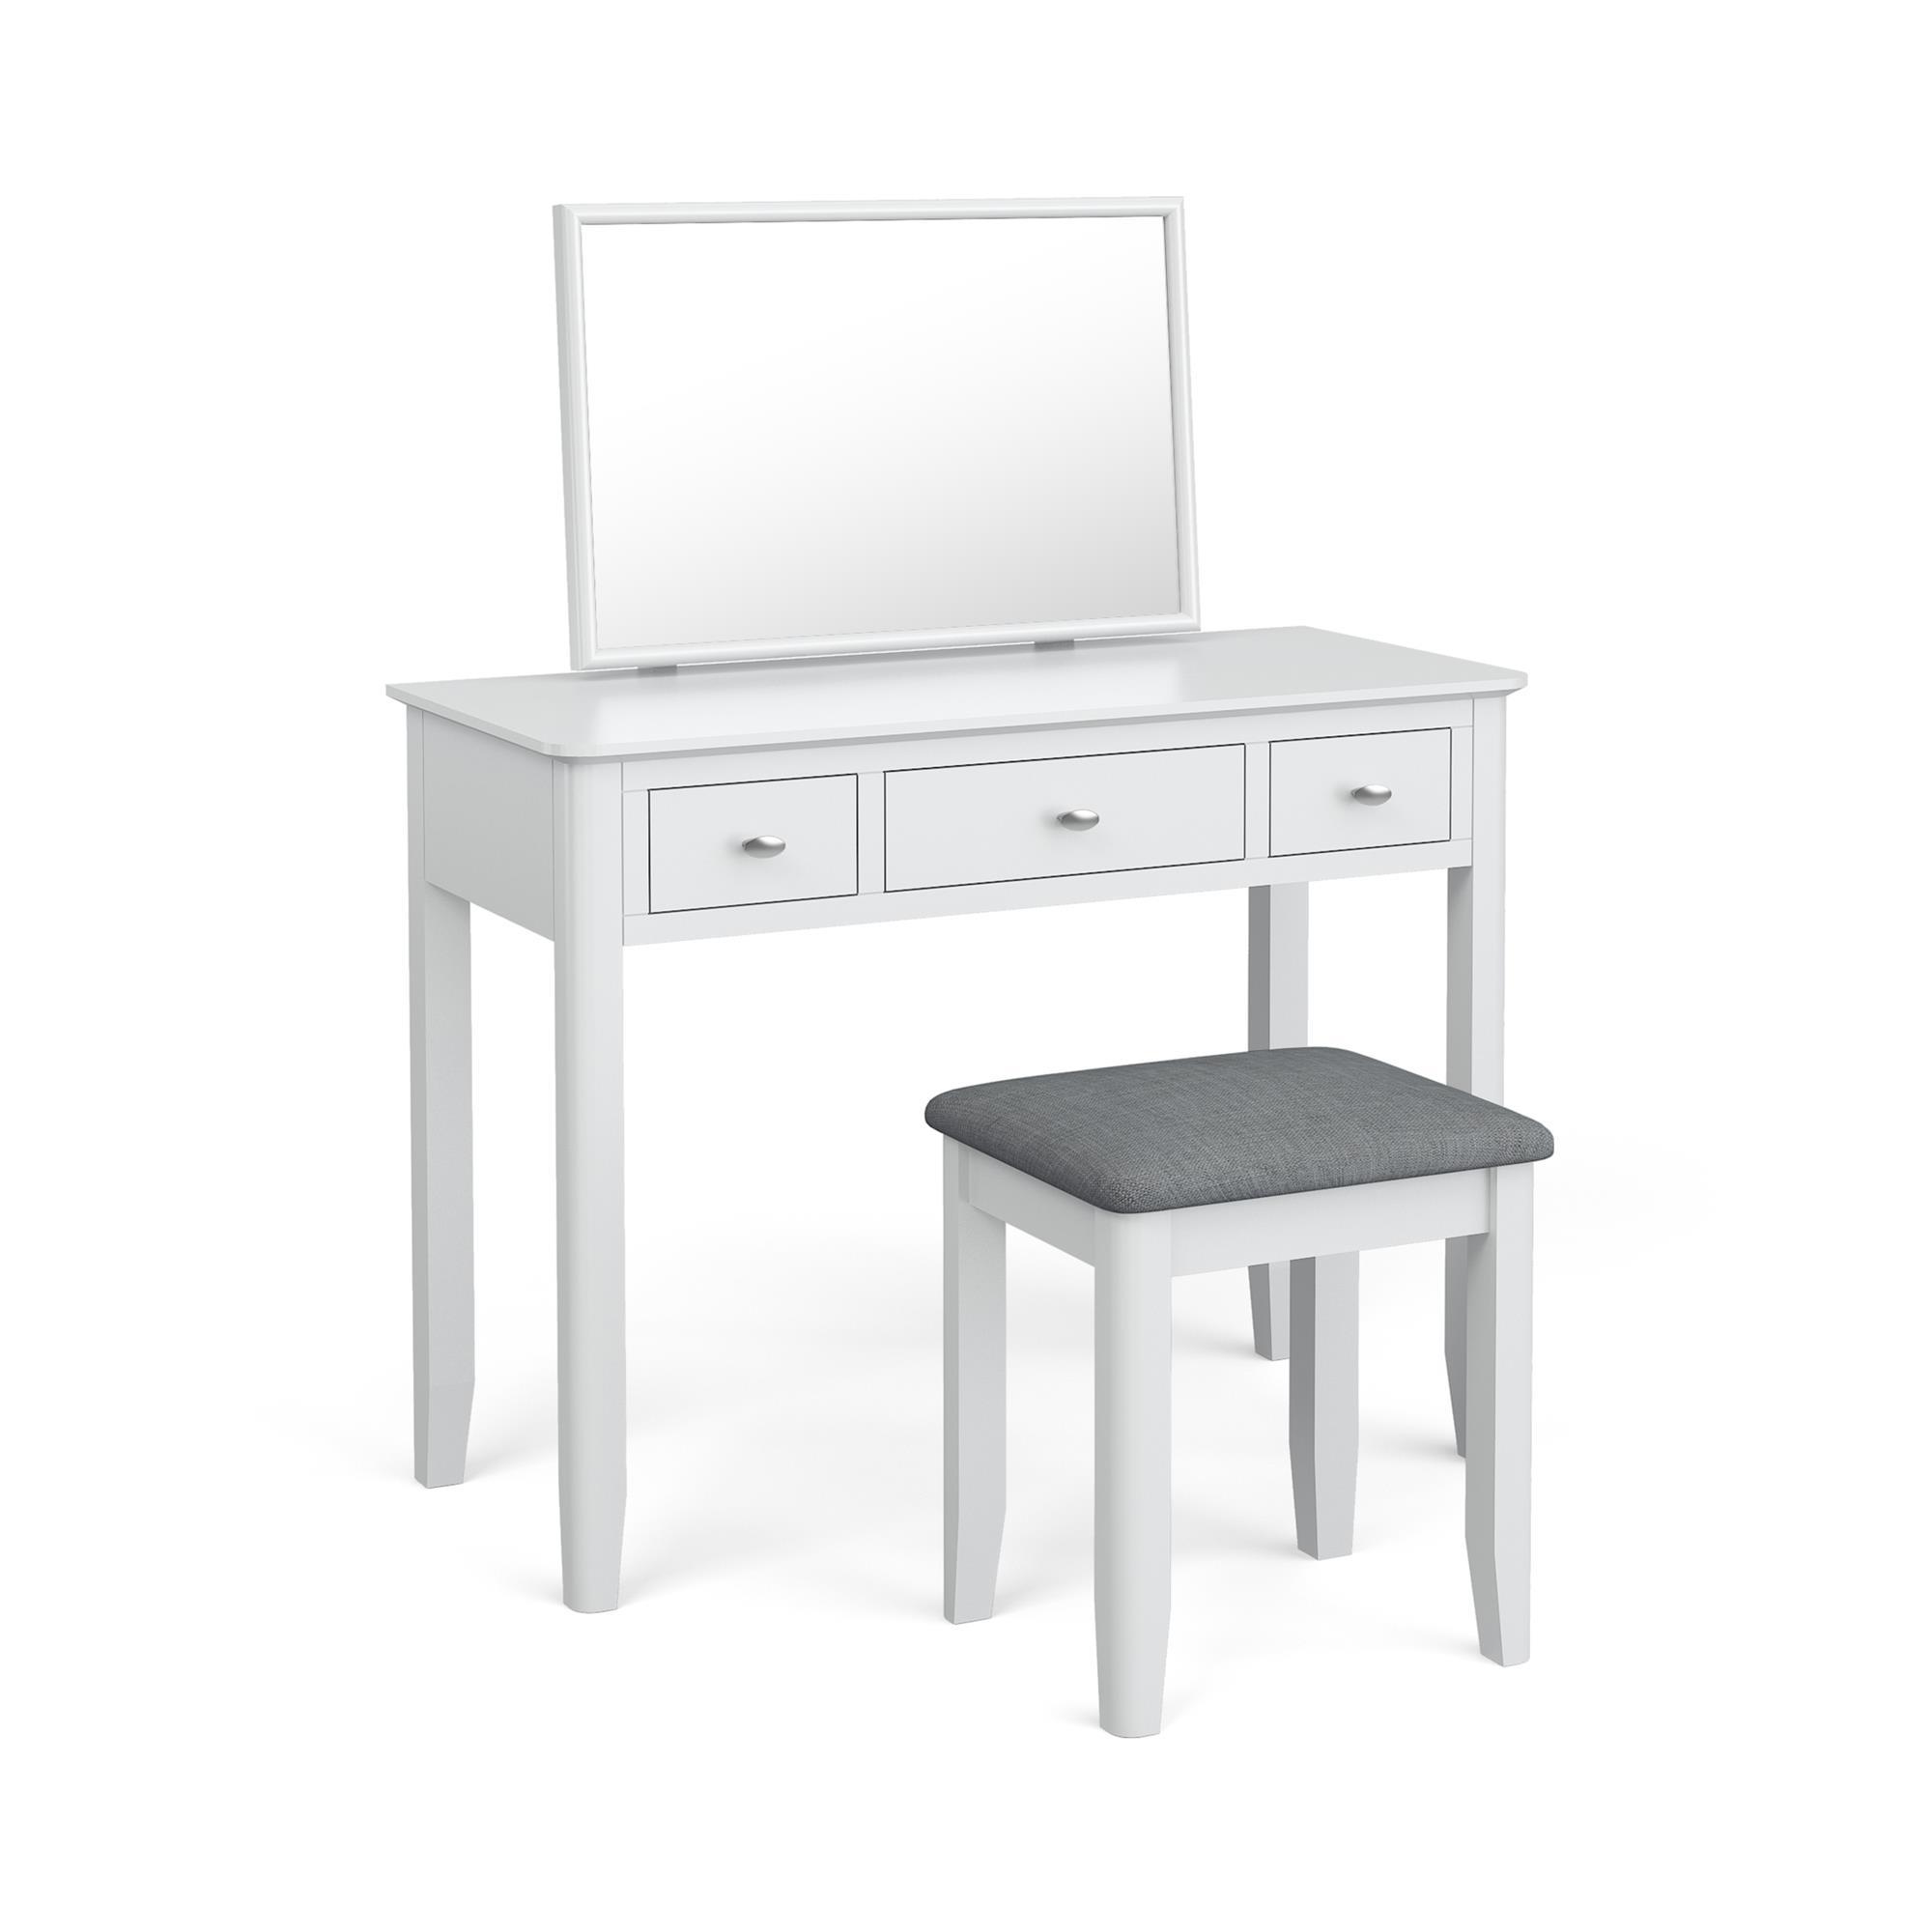 Hampstead - Dressing Table Set - G5663